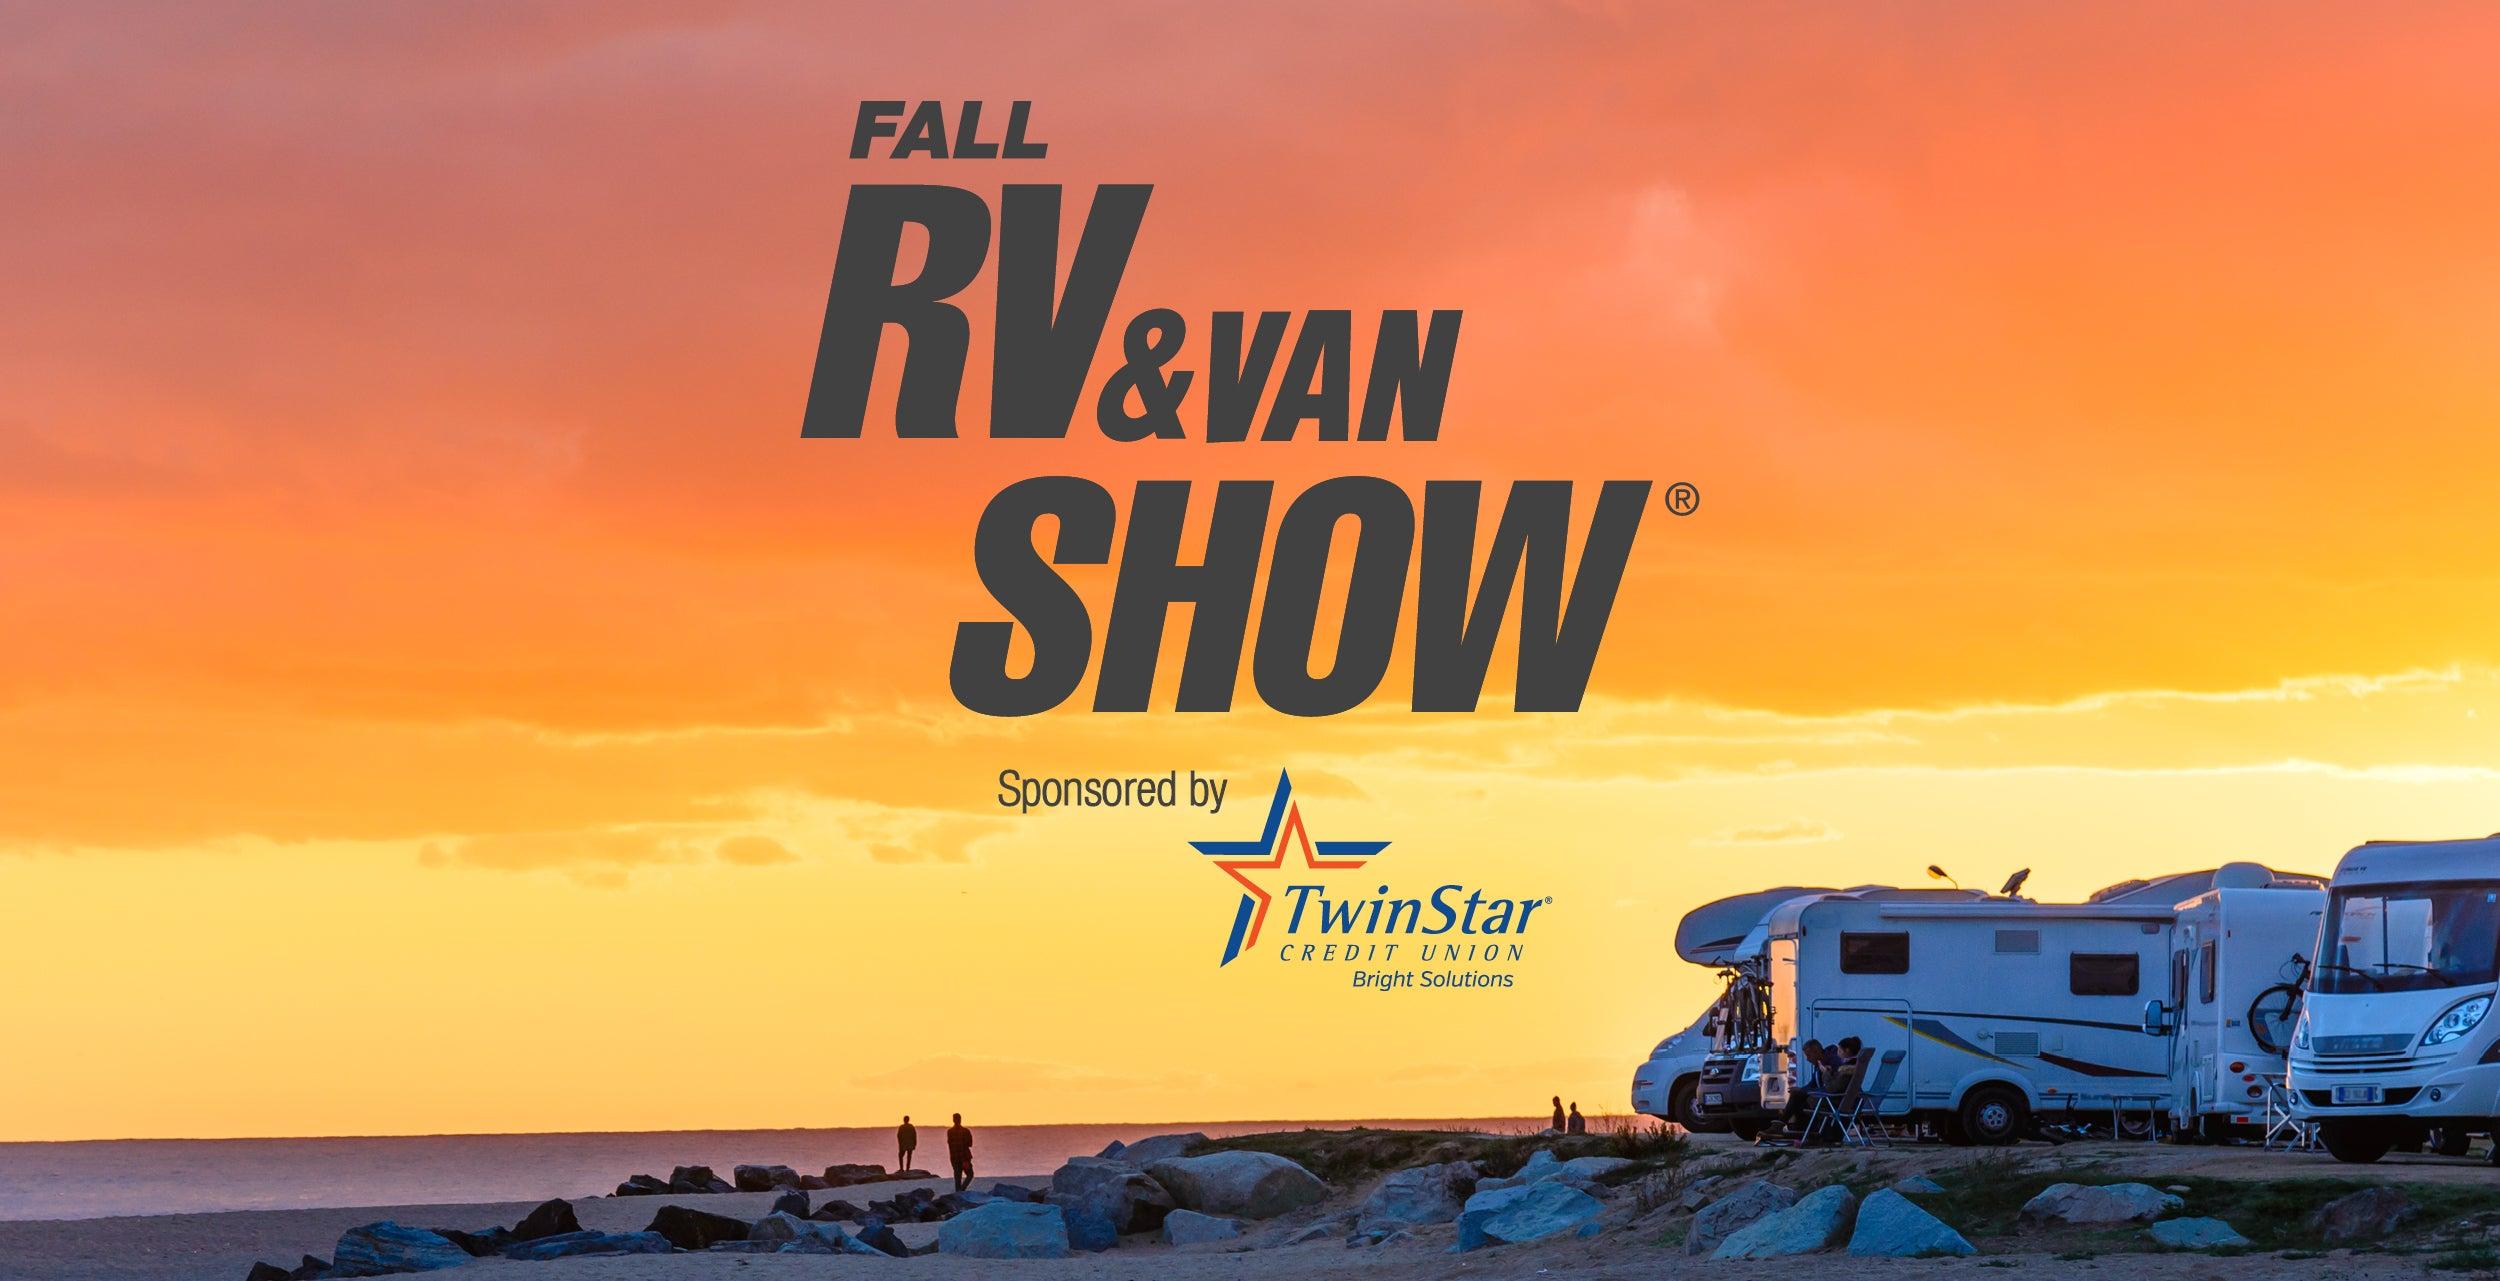 Portland Fall RV & Van Show